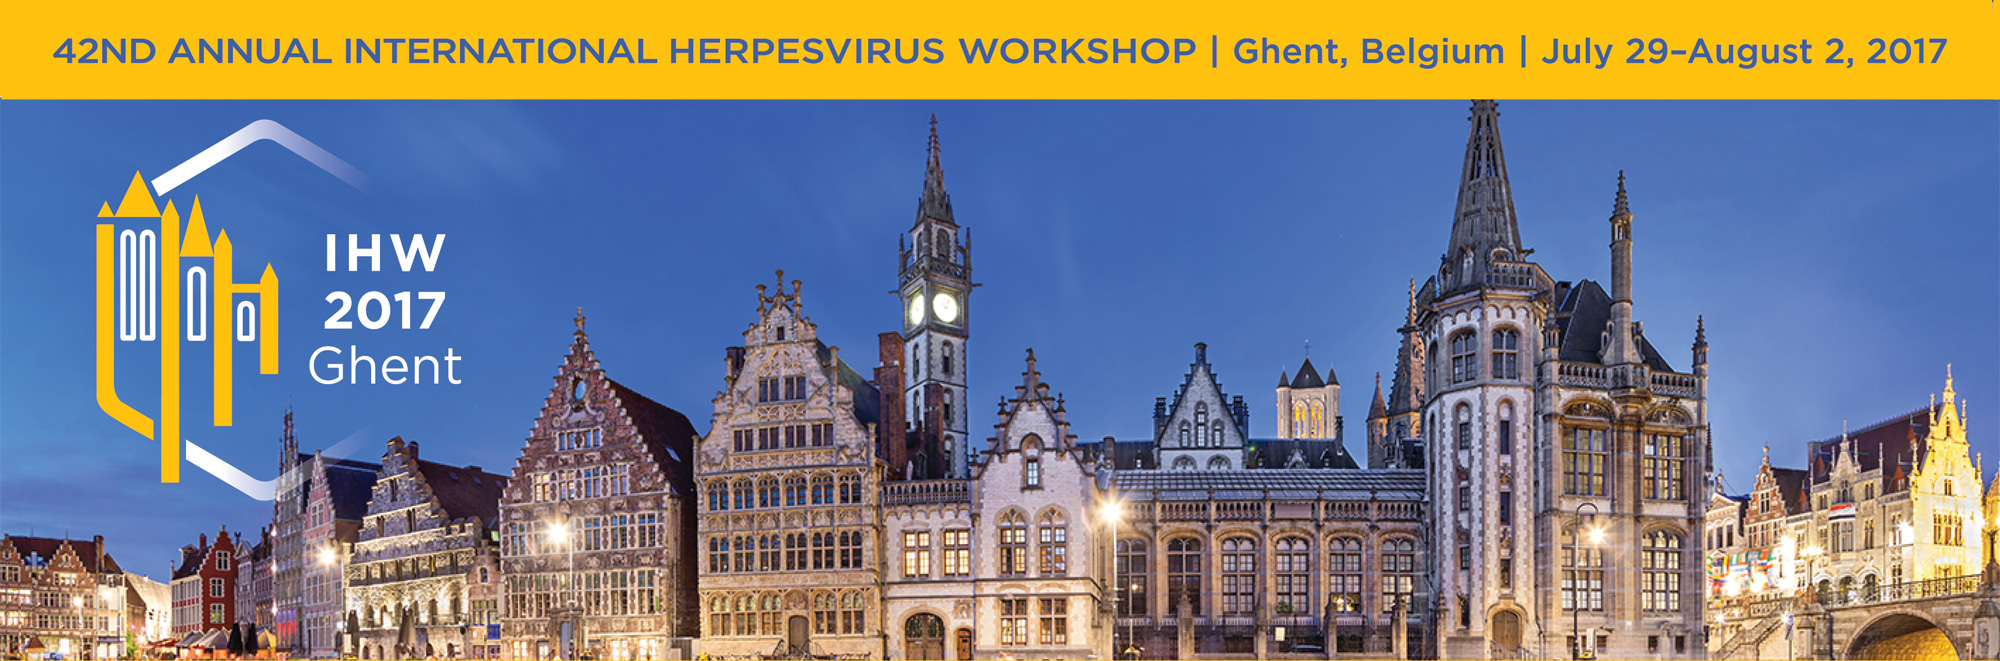 42nd Annual International Herpesvirus Workshop |  Ghent, Belgium | July 29-August 2, 2017